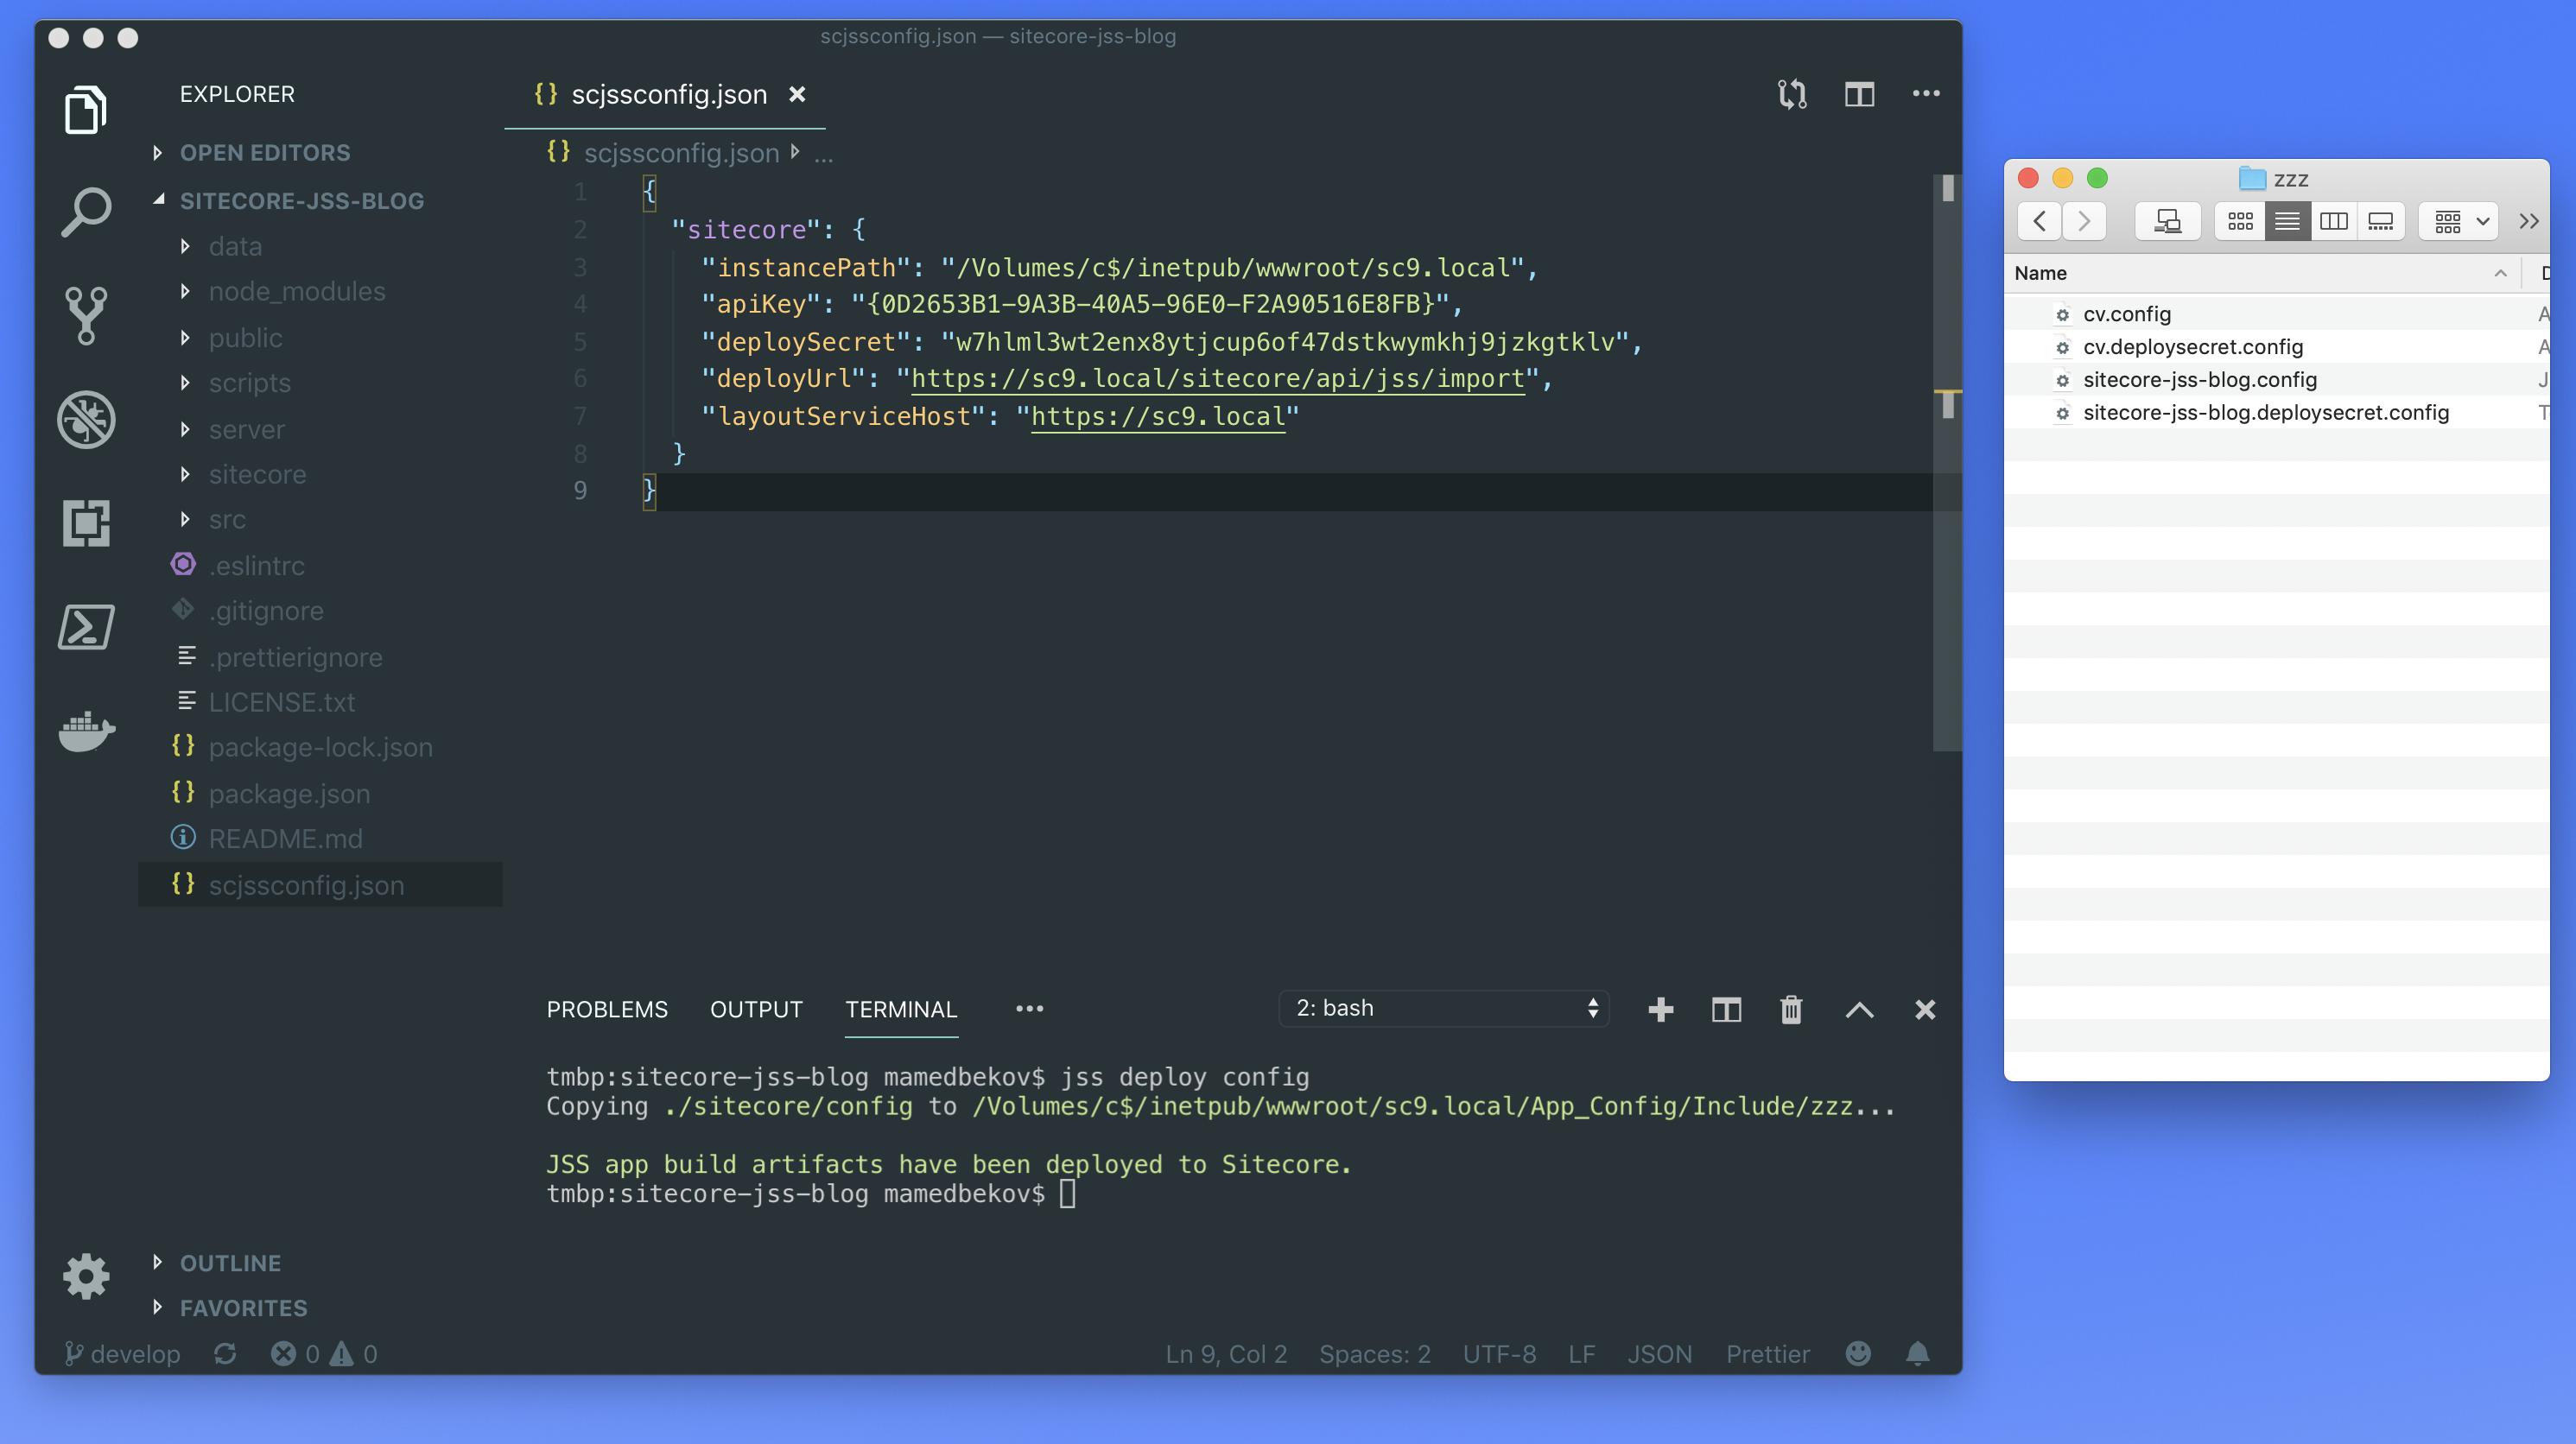 Sitecore JSS Configs